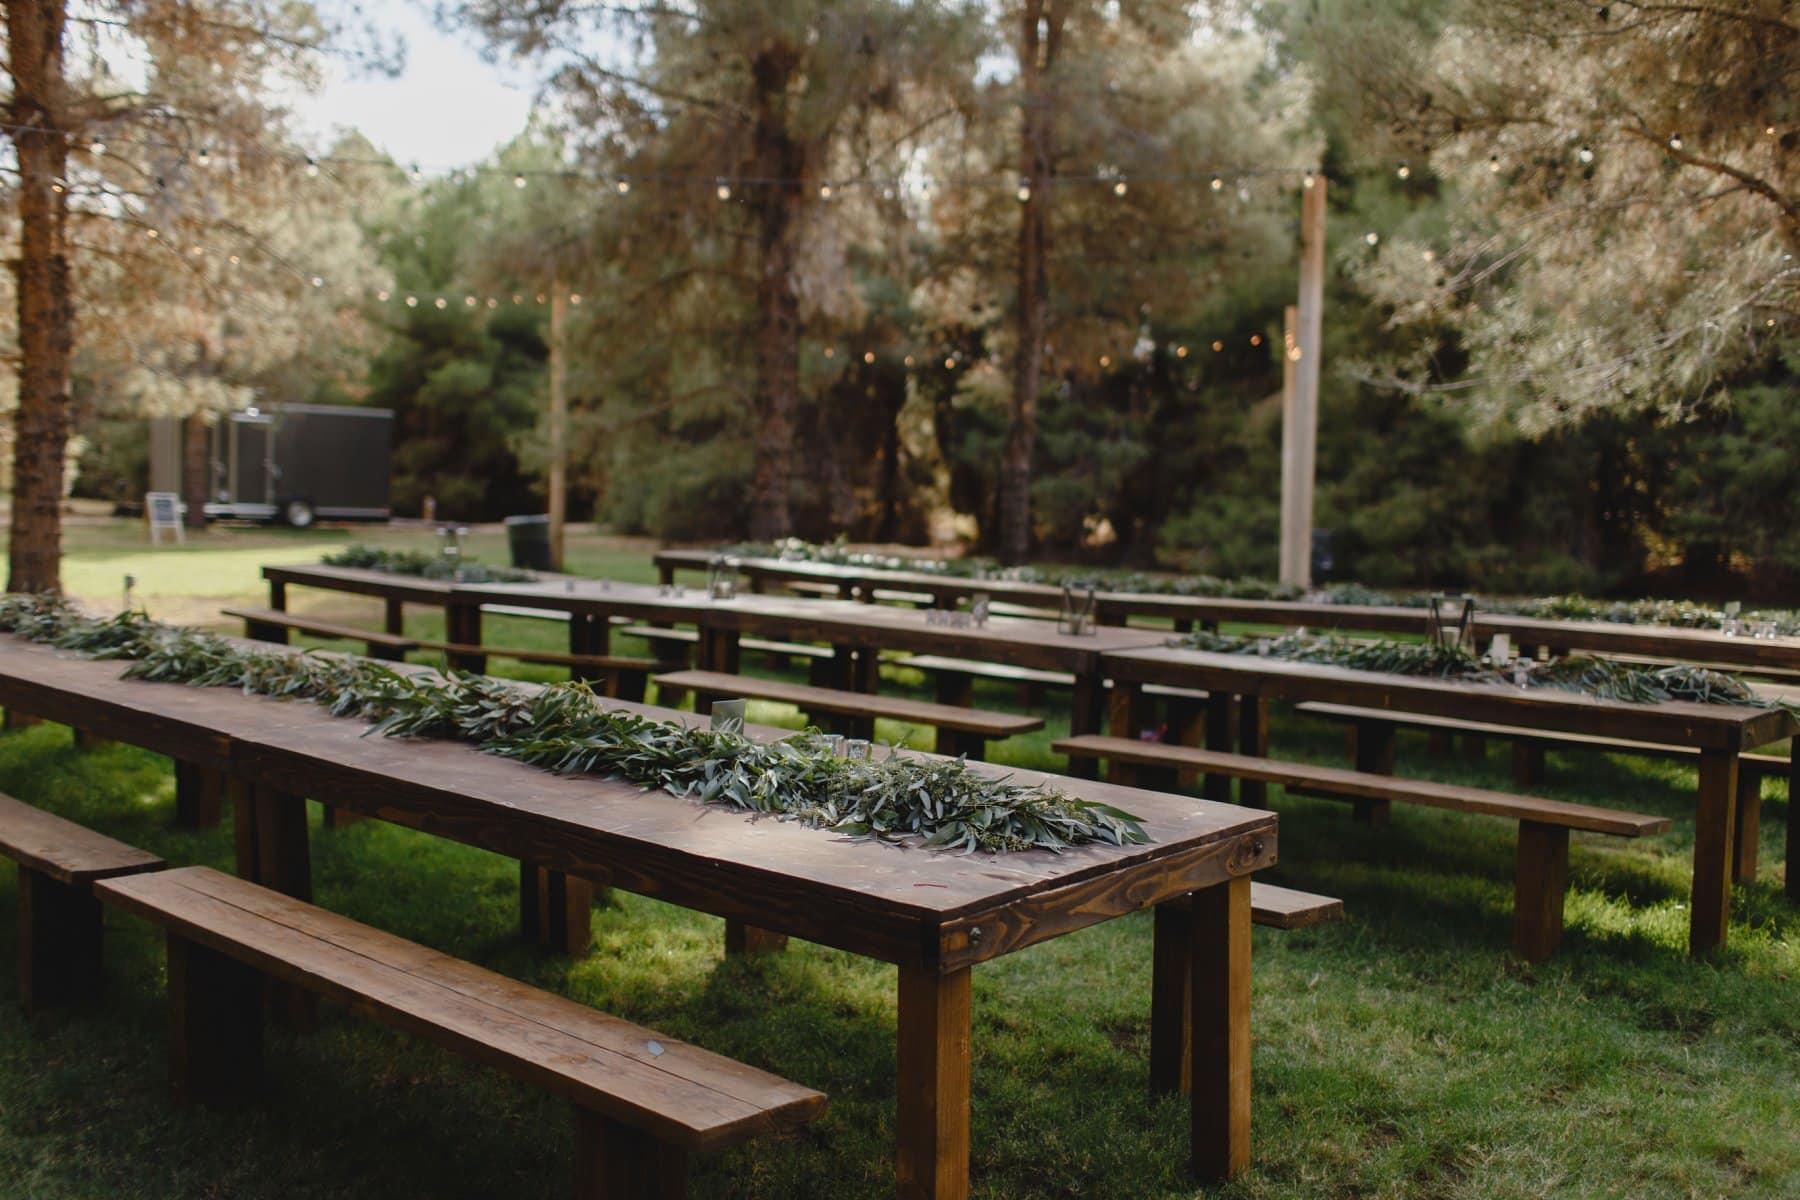 The Meadow at Schnepf Farms outdoor pine tree wedding venue